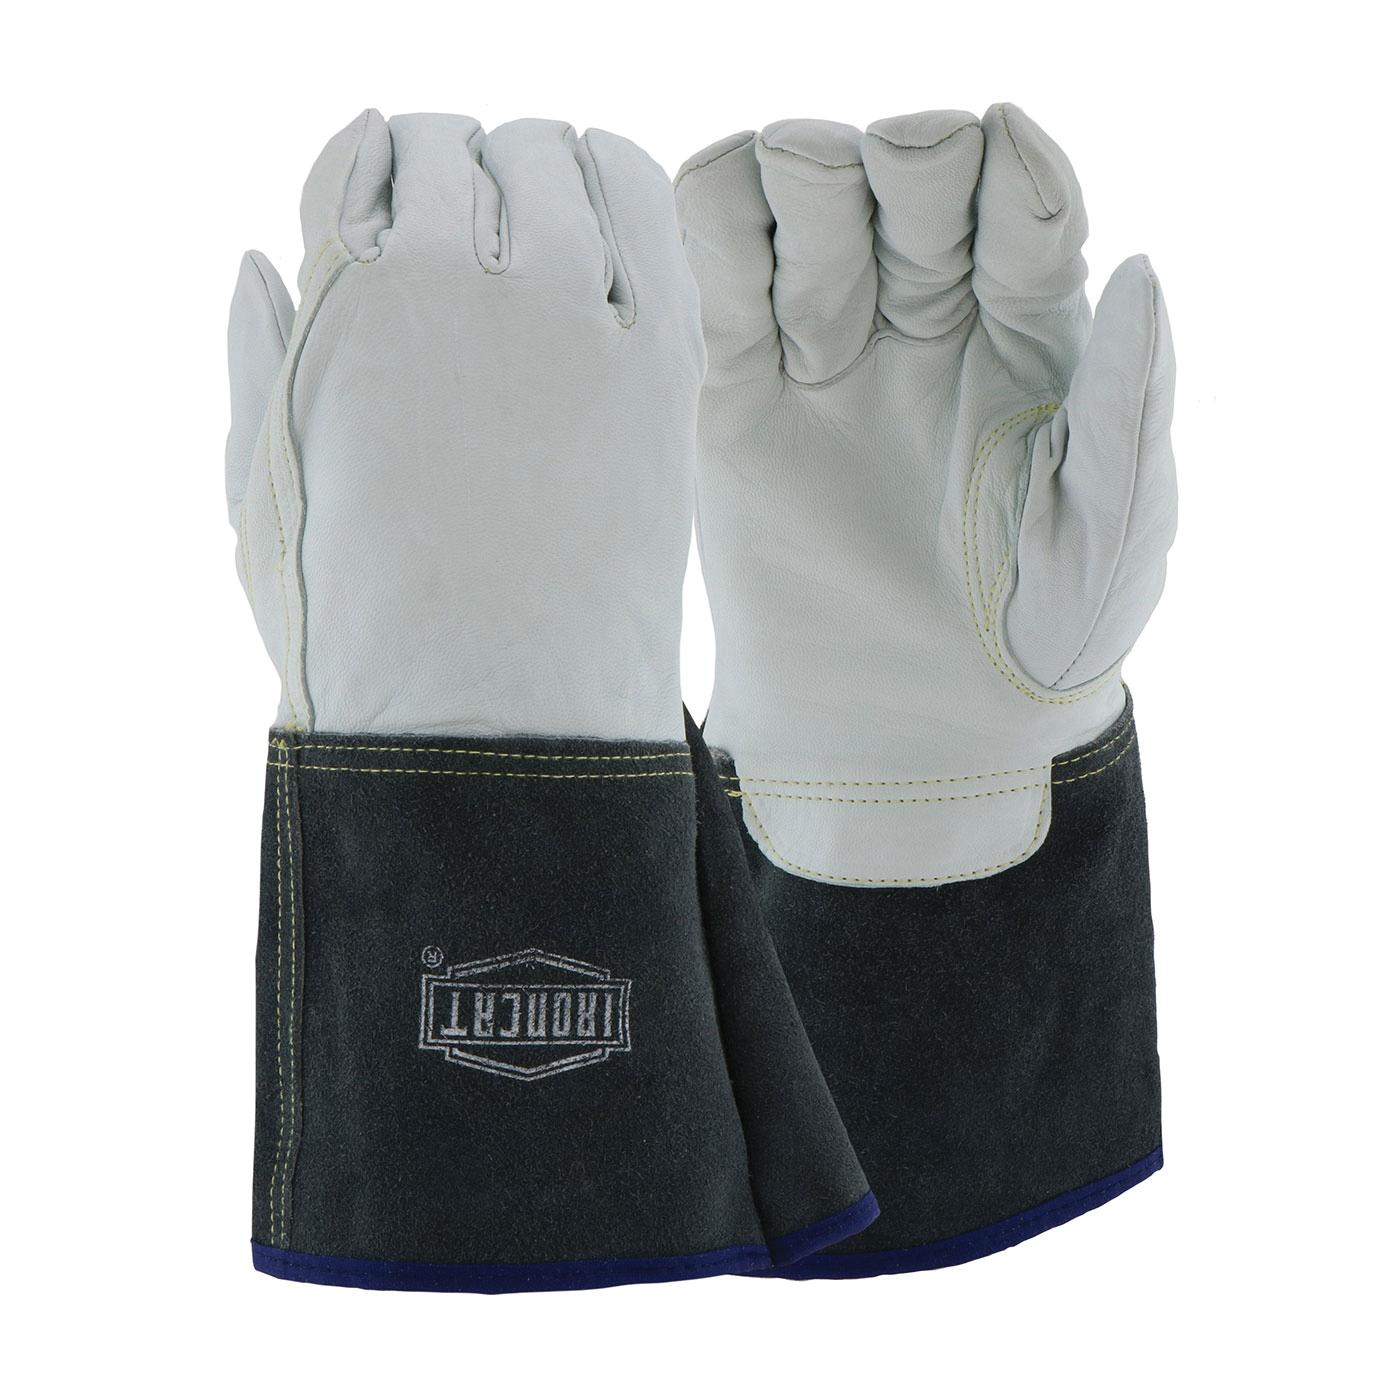 Ironcat® 6144/L Welding Gloves, L, Premium Top Grain Kidskin Leather, Black/White, Kevlar® Lining, Gauntlet Cuff, 13-5/8 in L